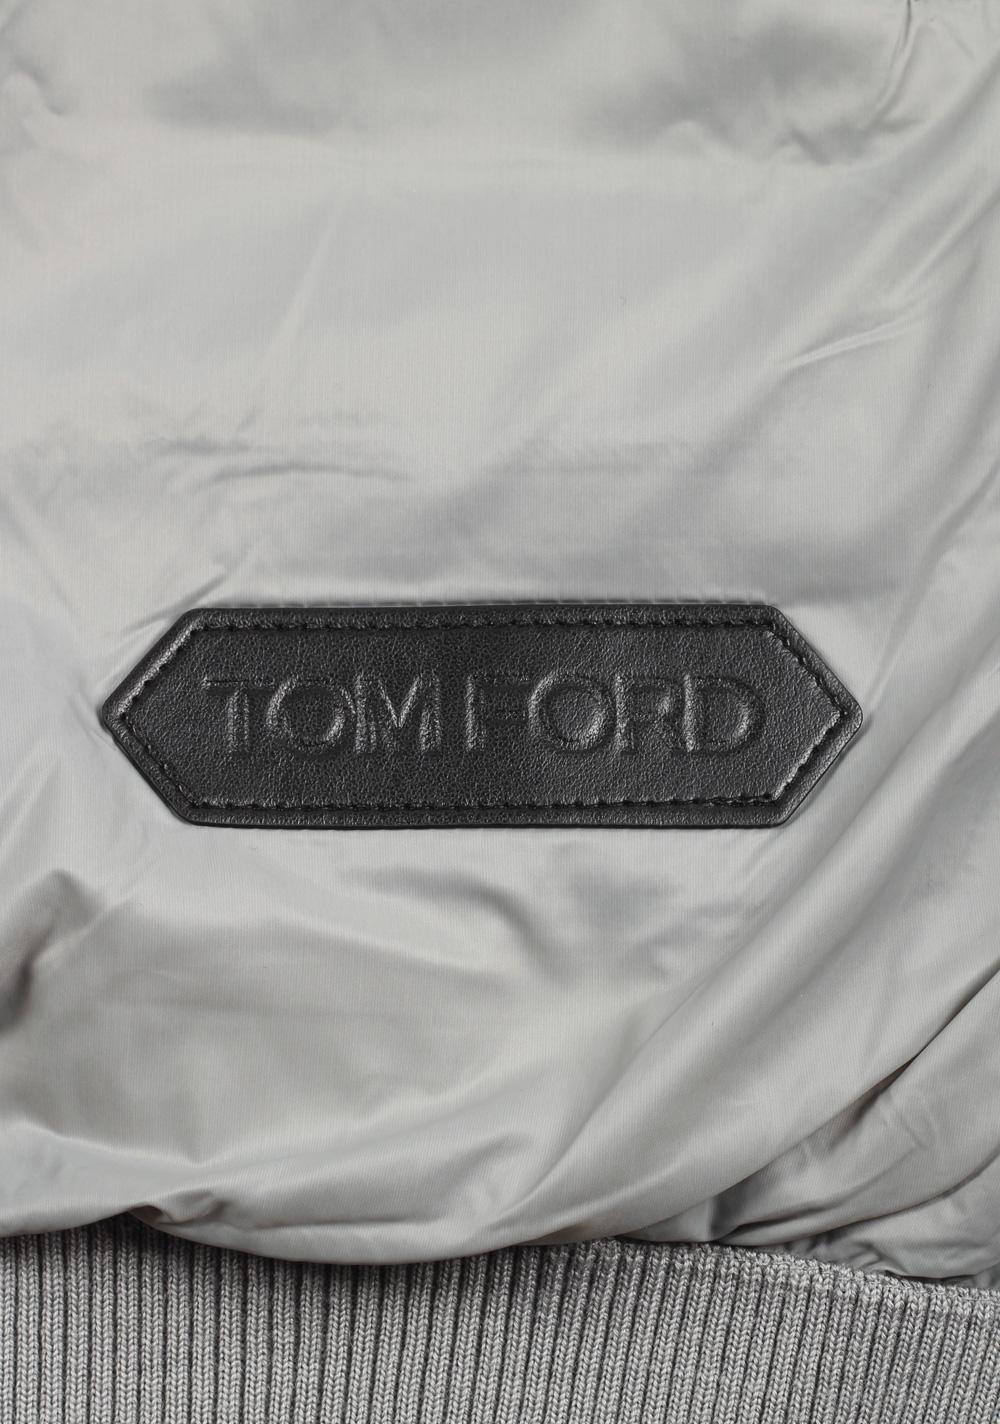 TOM FORD Gray James Bond Spectre Bomber Jacket   Costume Limité